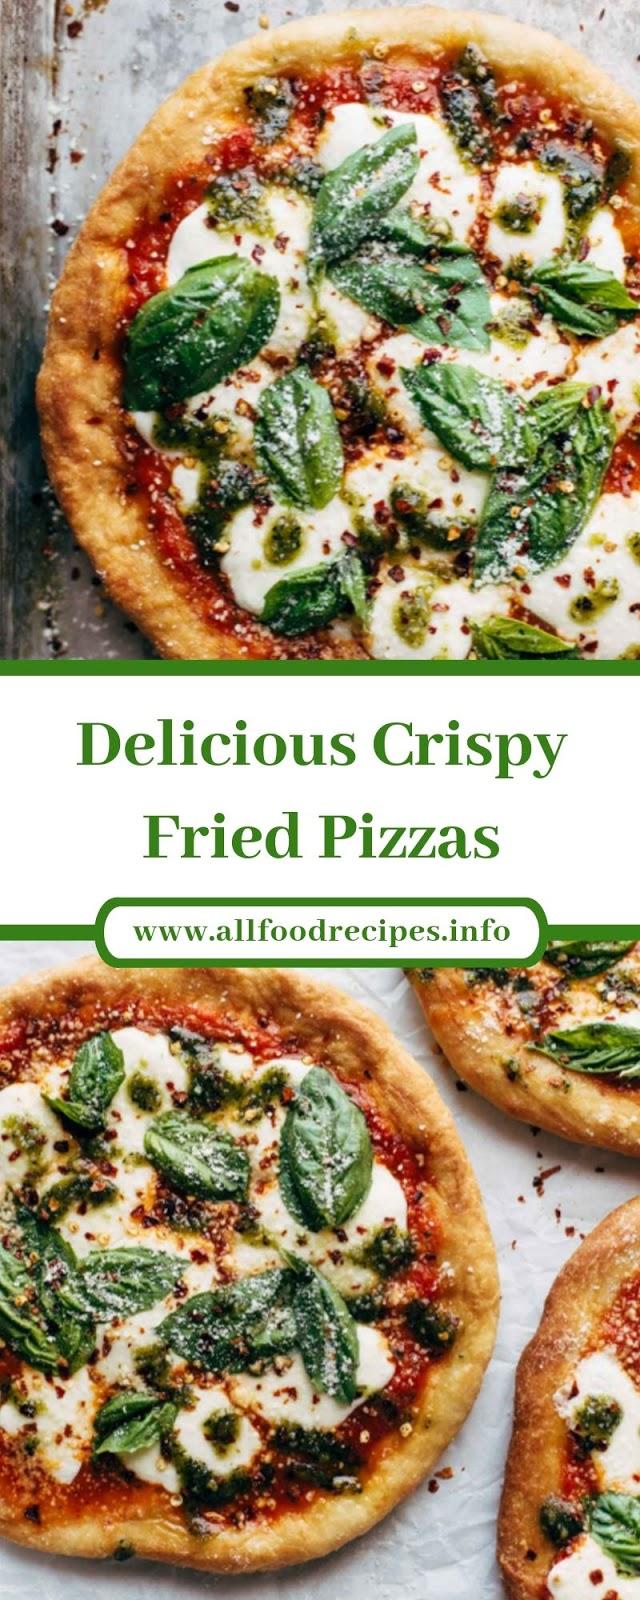 Delicious Crispy Fried Pizzas